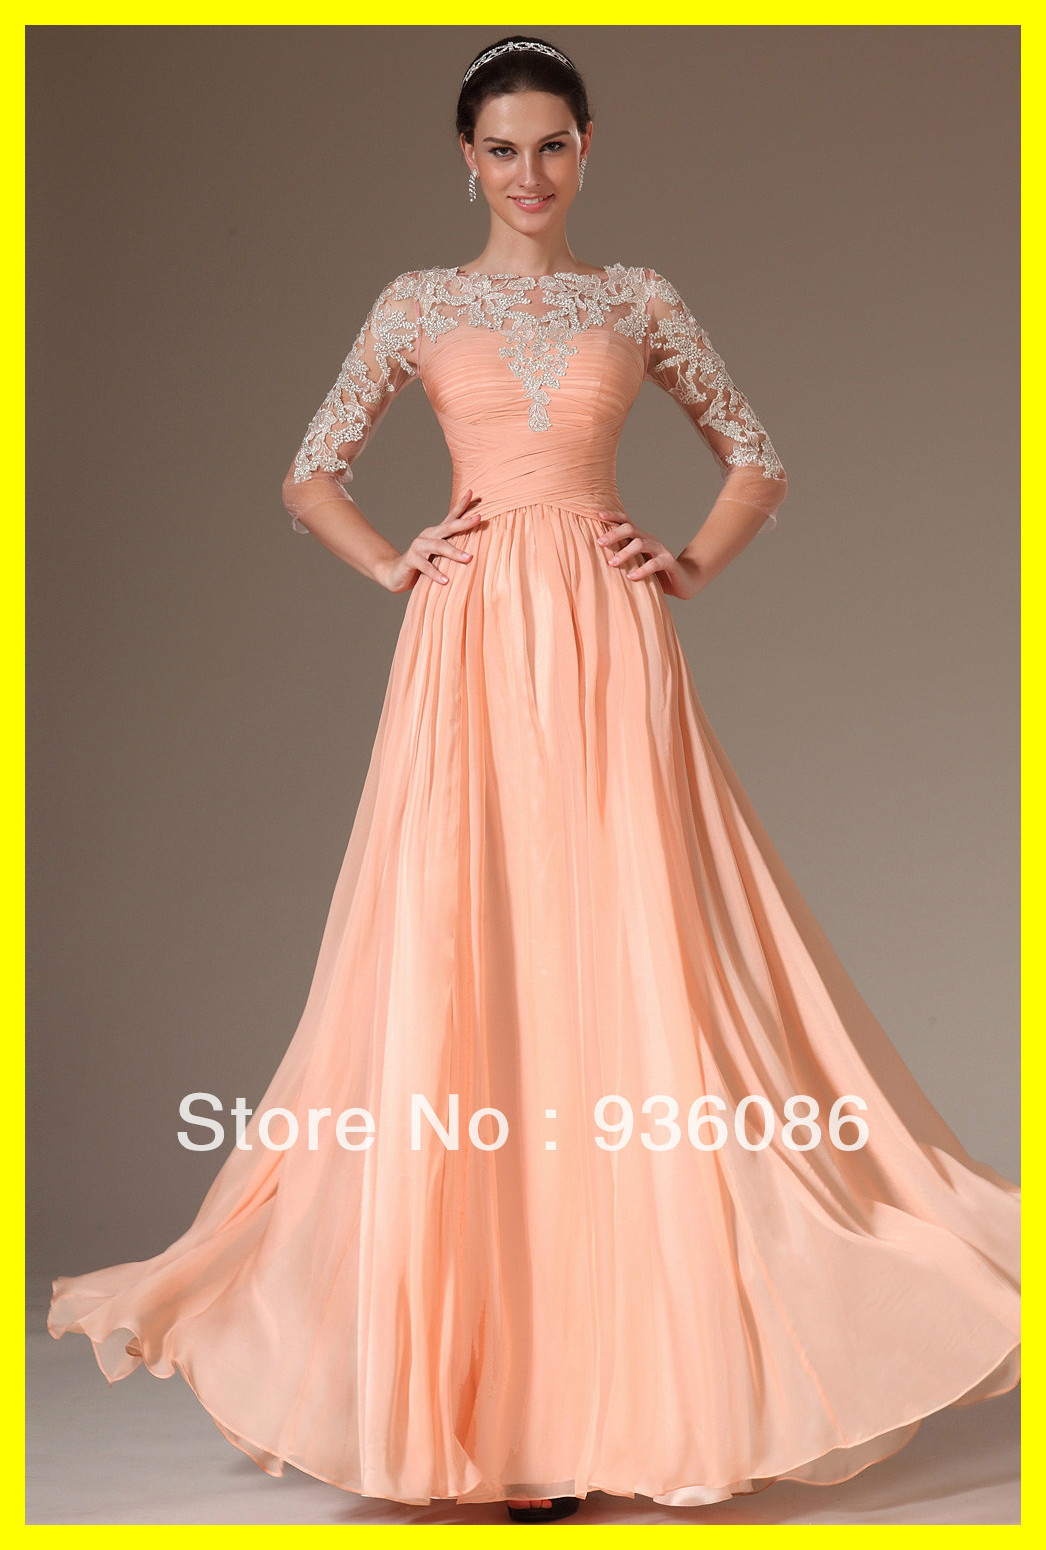 Tall Girl Prom Dresses - Ocodea.com